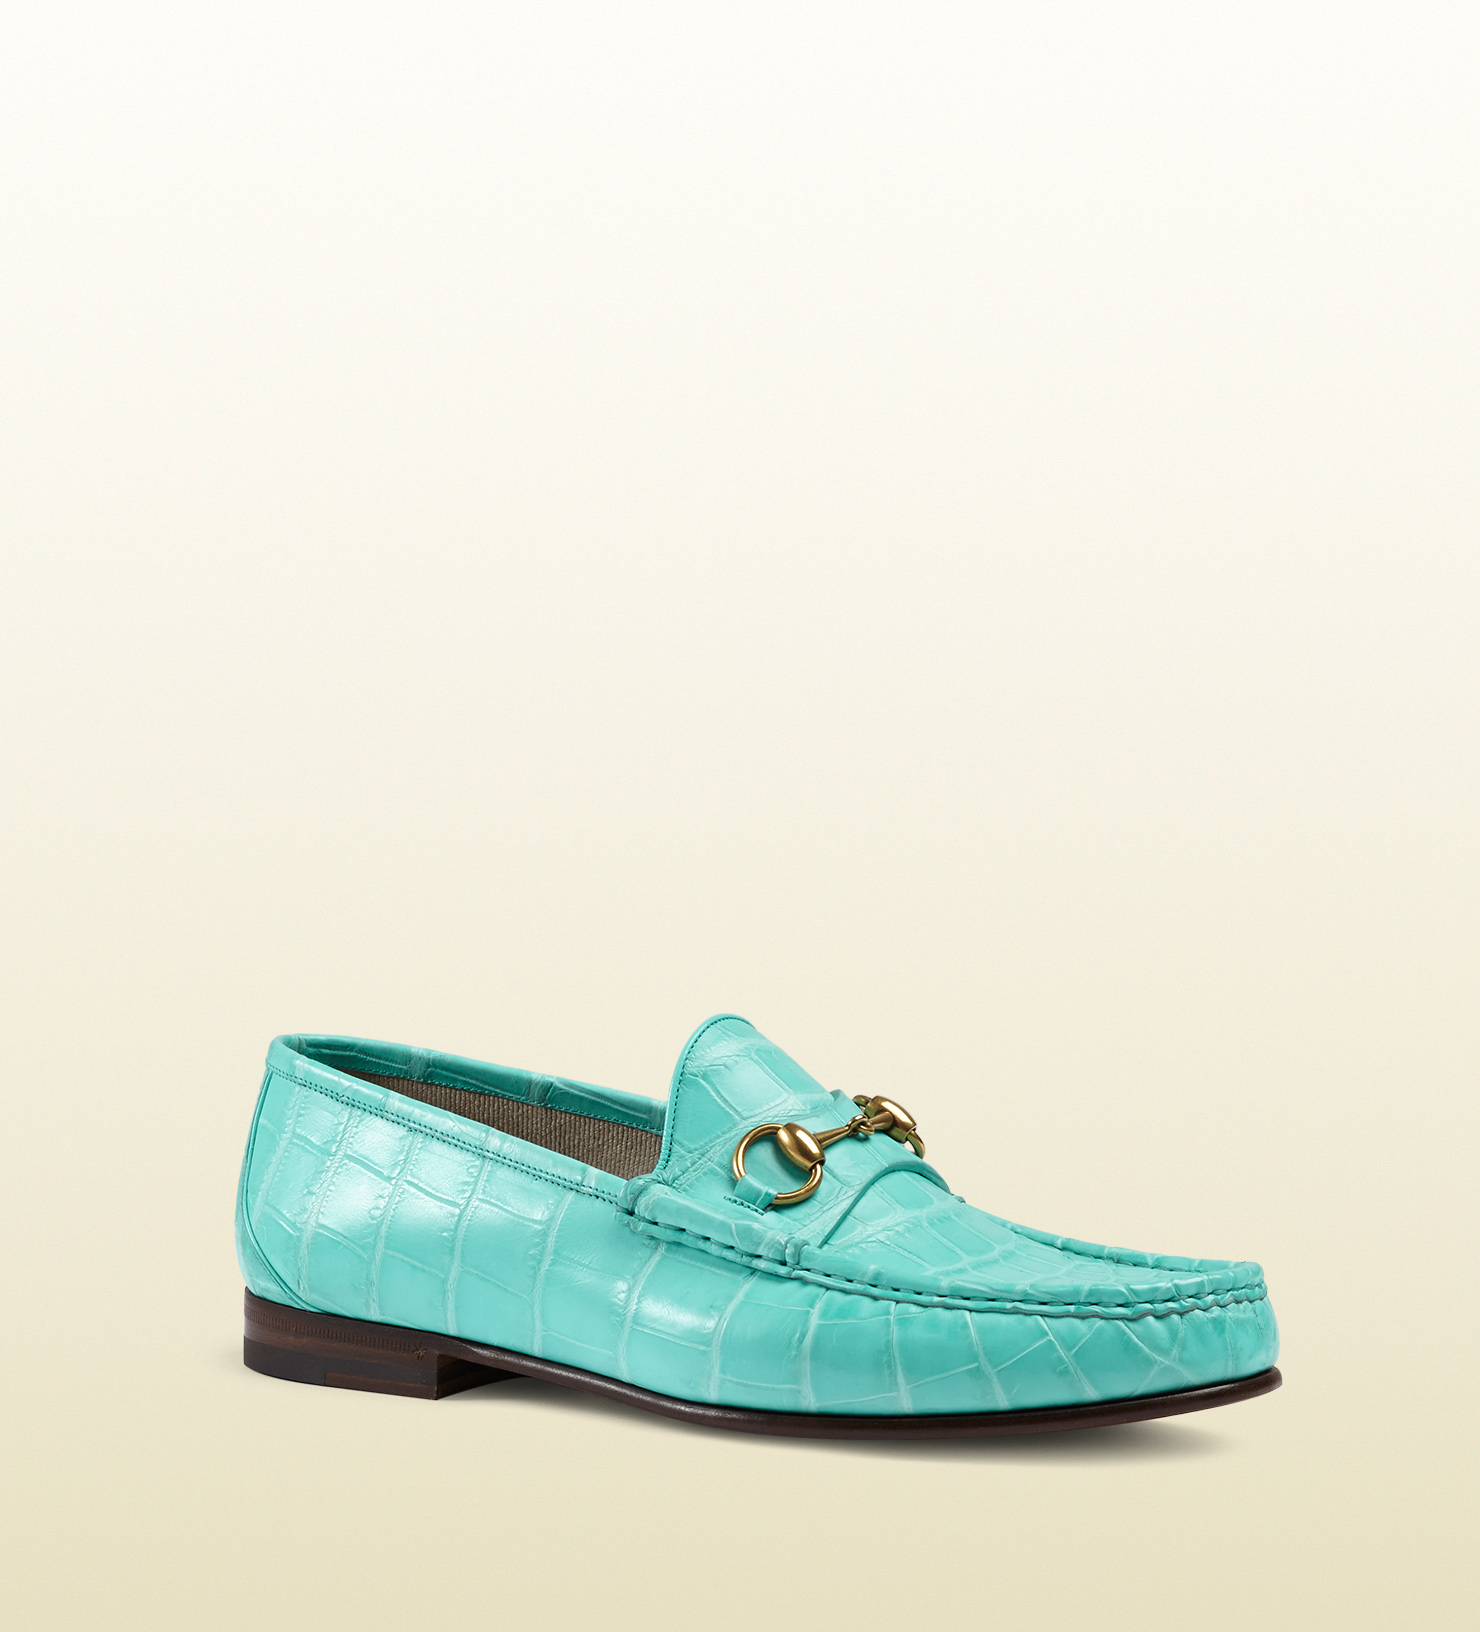 f1504234071 Gucci 1953 Horsebit Loafer In Crocodile in Blue for Men - Lyst